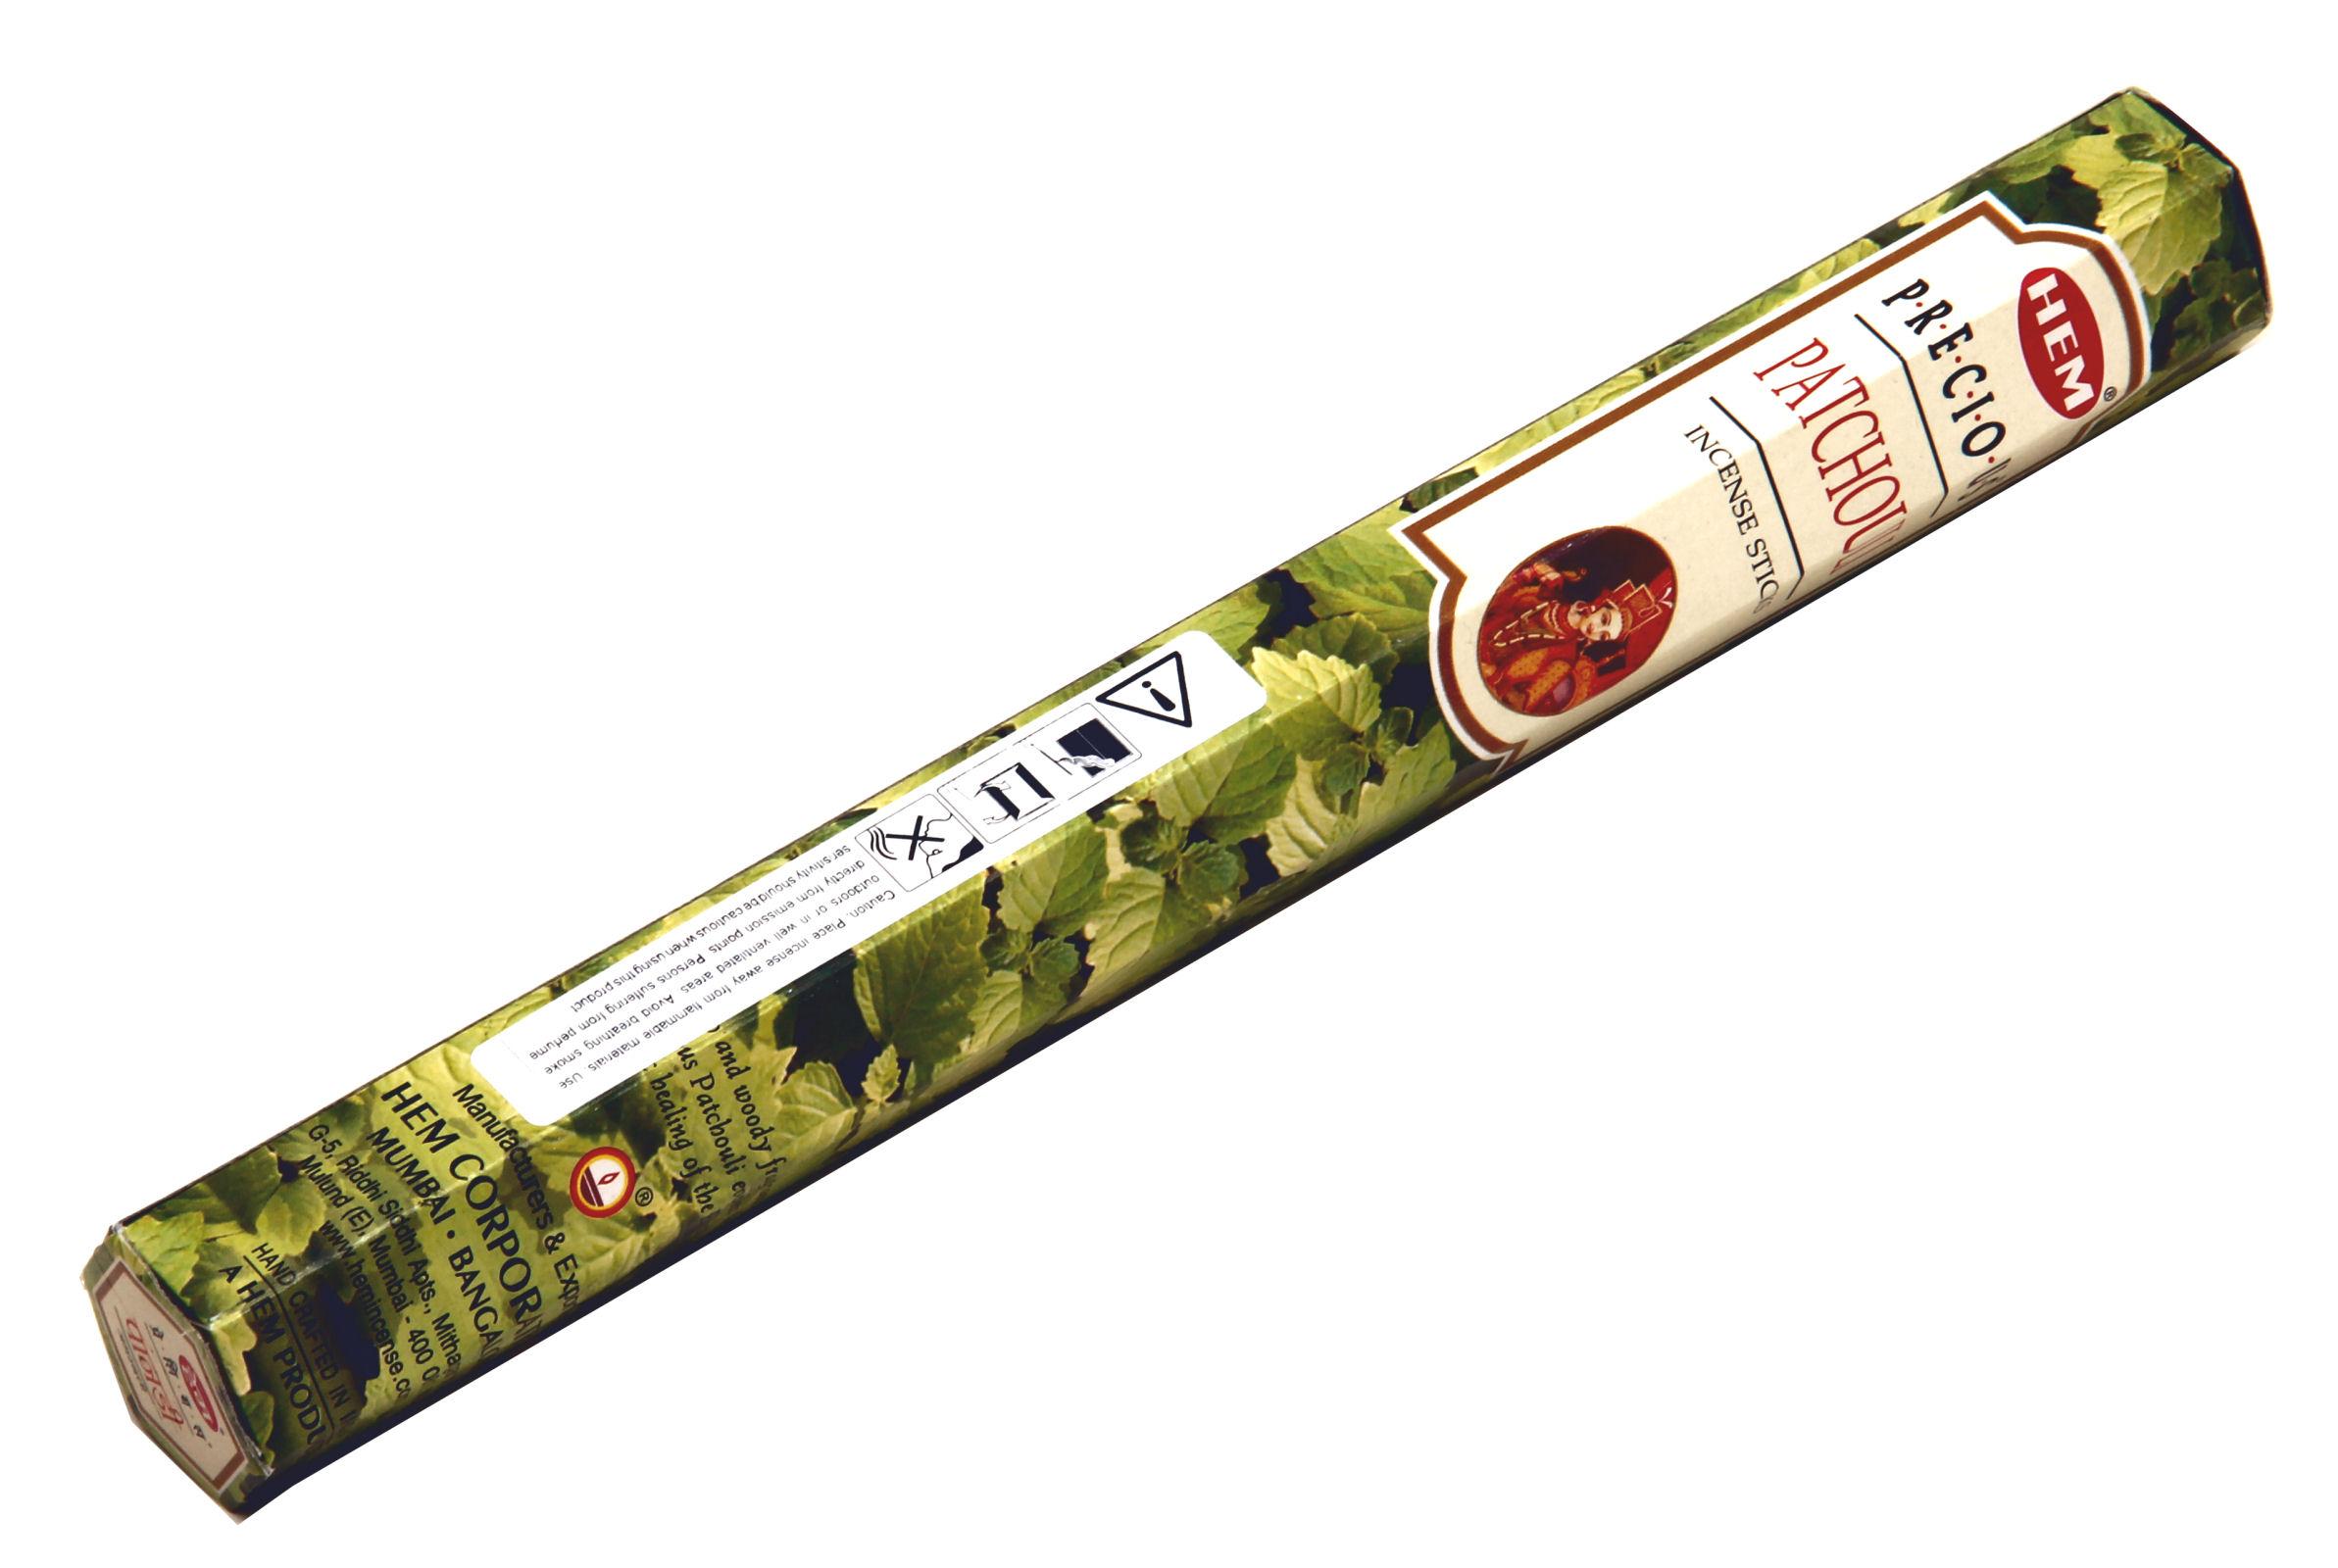 HEM Räucherstäbchen Precious Patchouli 20g Hexa Packung  Ca. 20 Incence Sticks